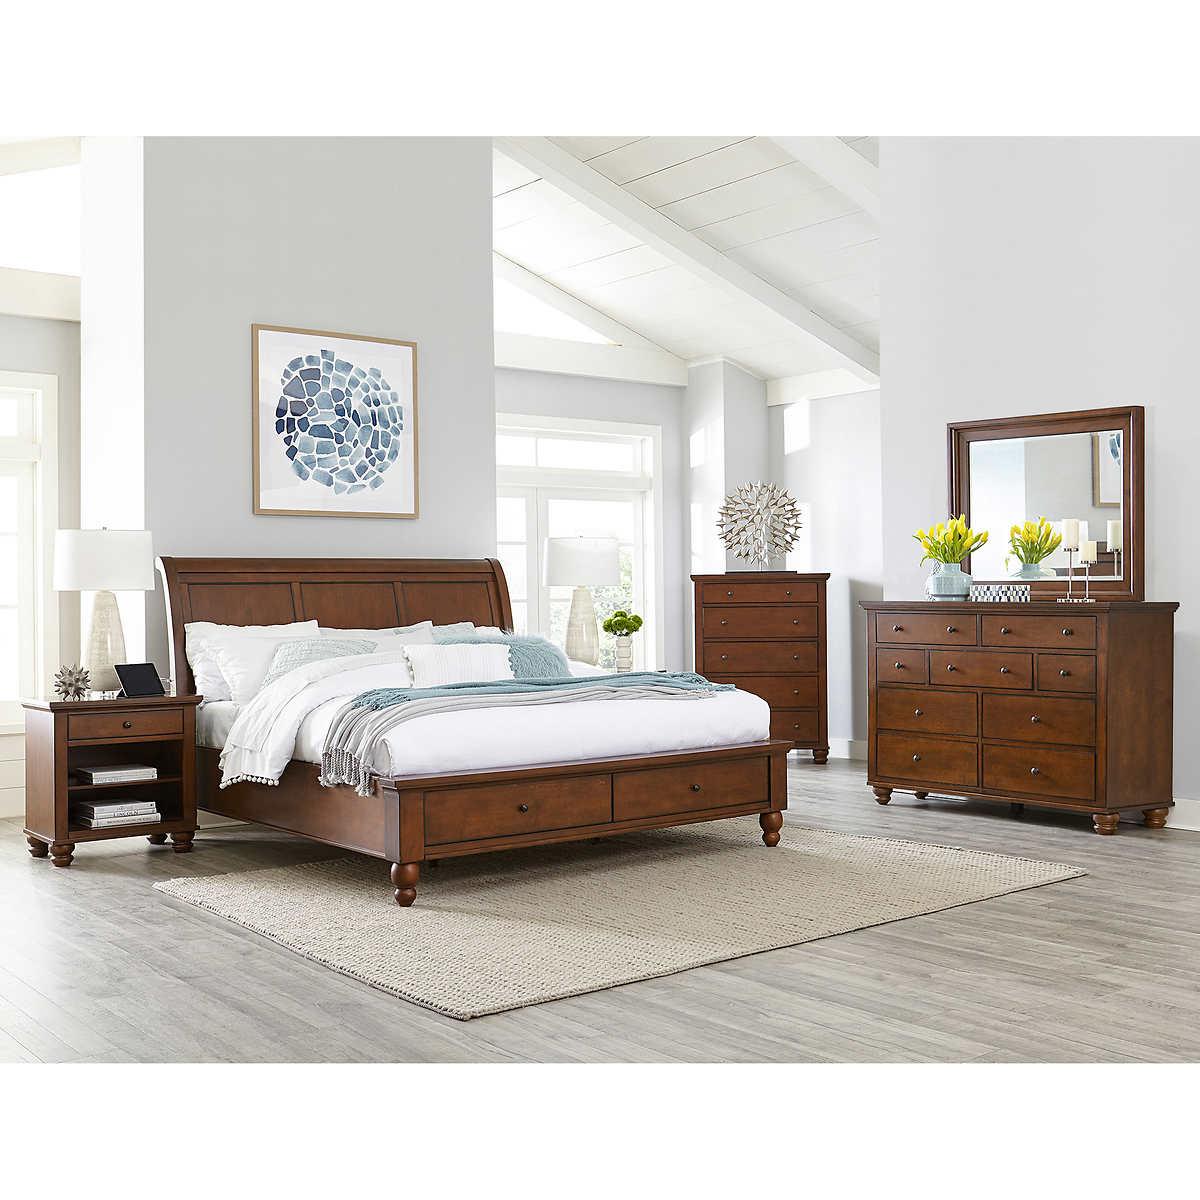 Ashfield 6-piece Cal King Storage Bedroom Set